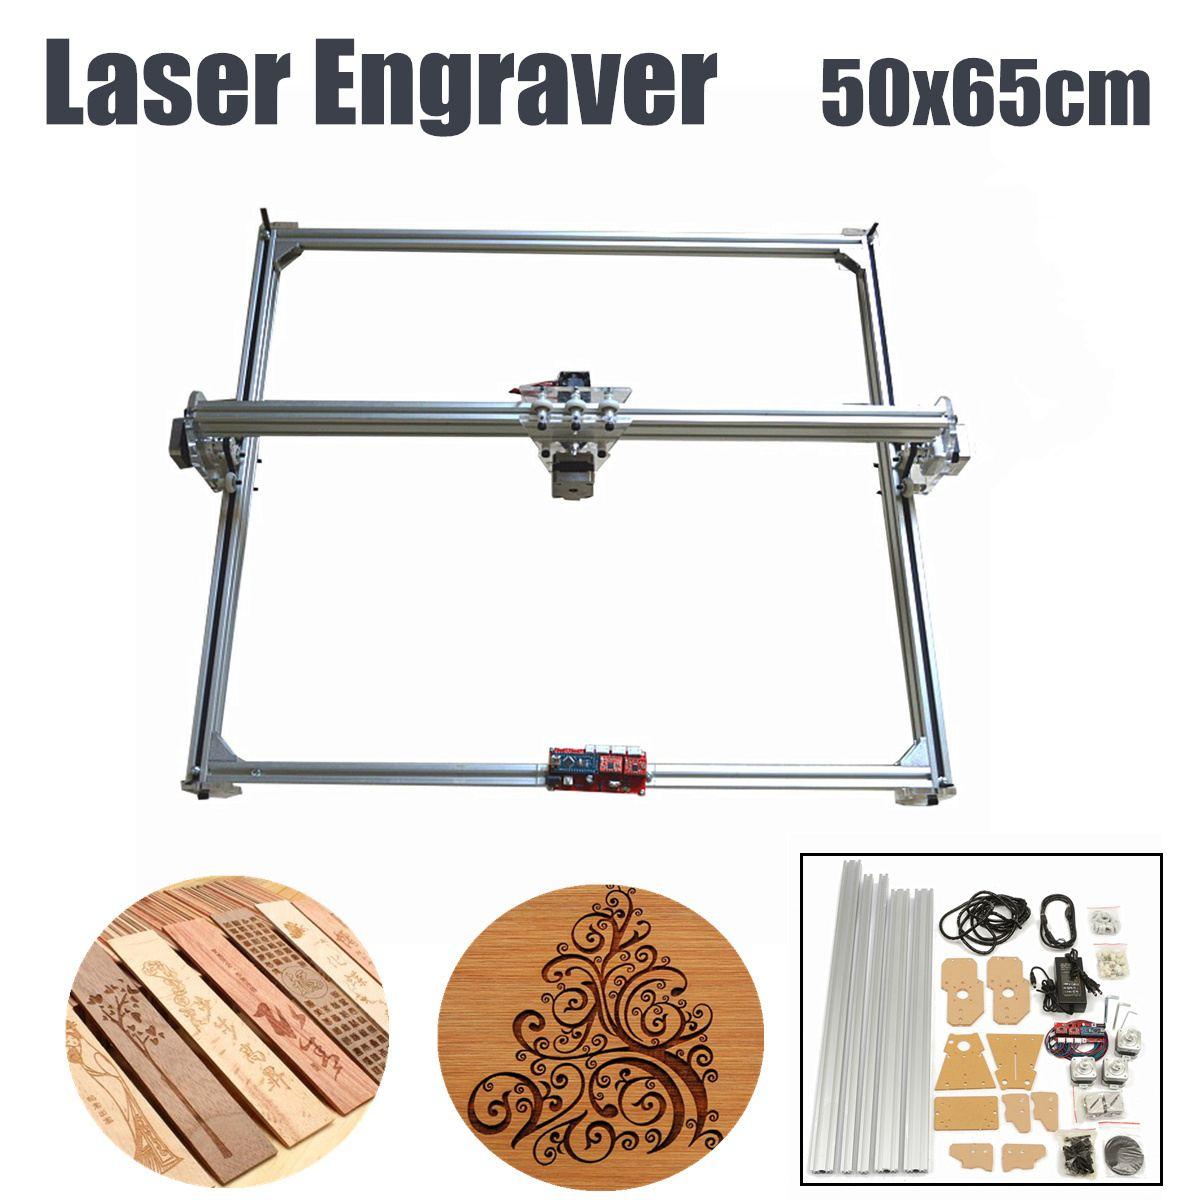 50*65cm 100 mw-10 W DIY escritorio Mini corte láser/grabado grabador máquina cc 12V cortador de madera/impresora/potencia ajustable